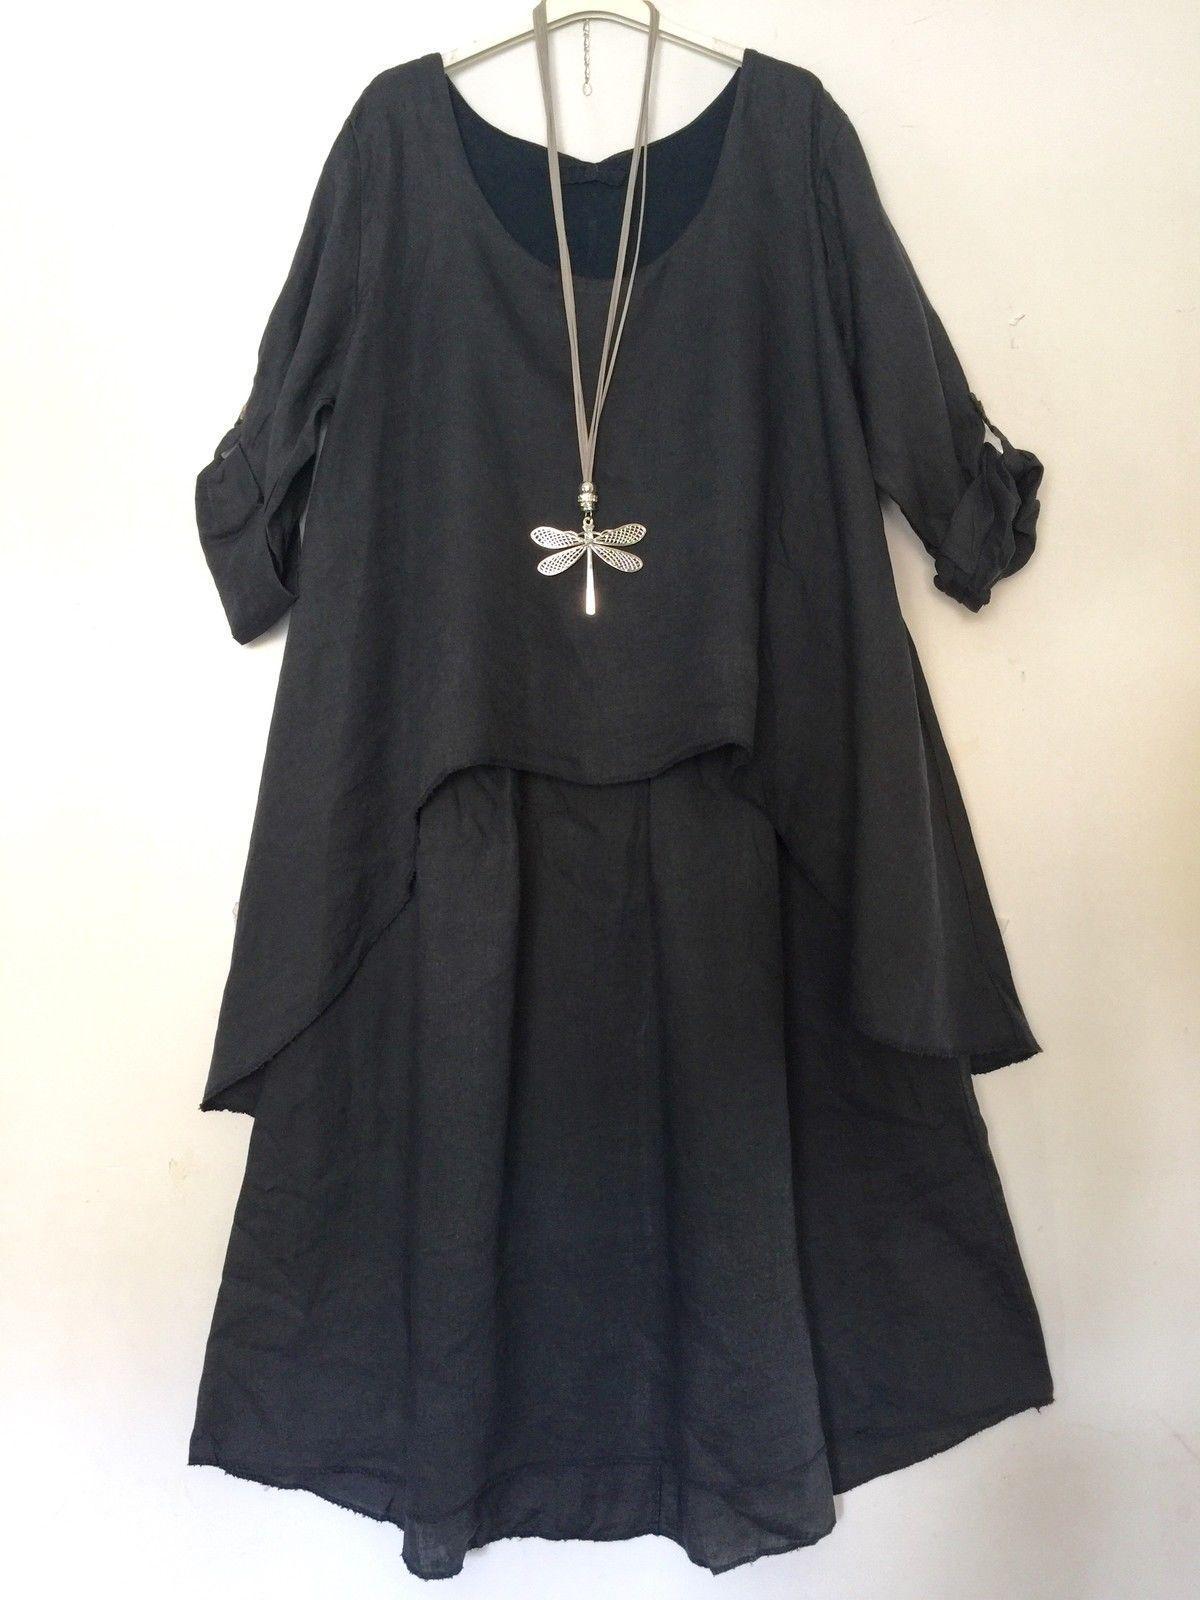 Naveed Mode Damen Tunika Shirt Top Bluse Stretch Lagenlook 38 40 42 44 46 48 50